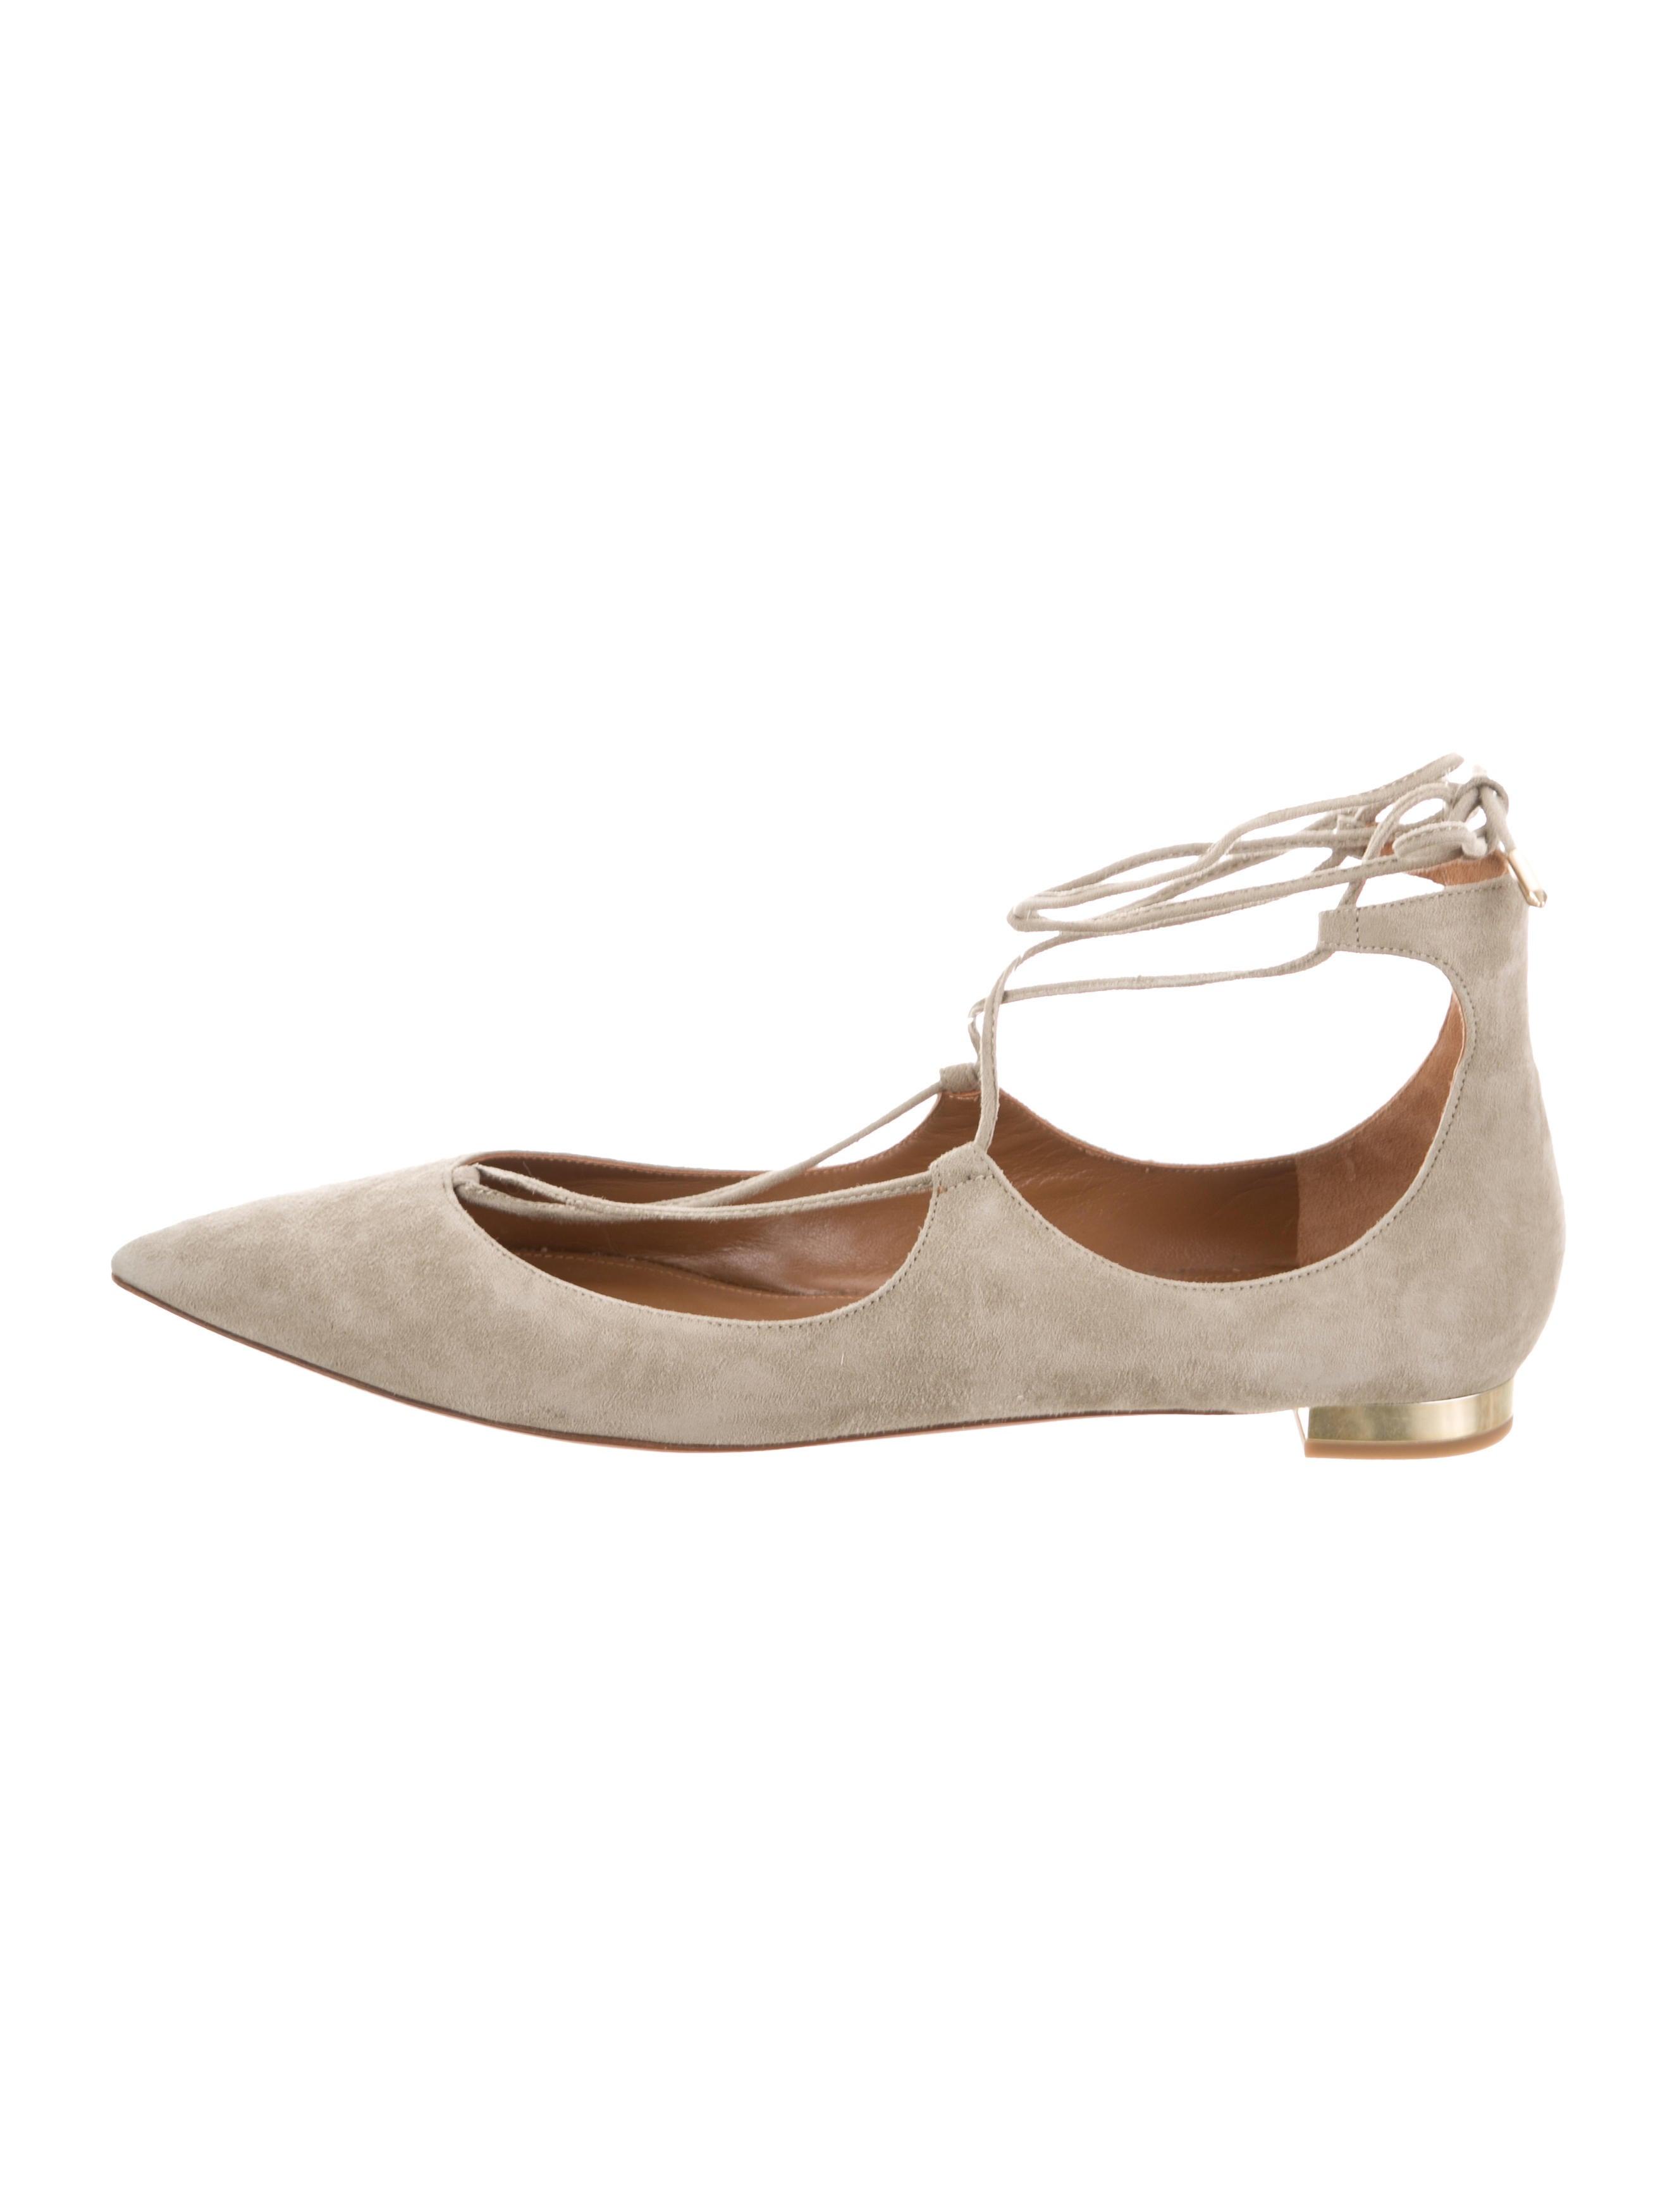 32686156b Aquazzura Christy Pointed-Toe Flats - Shoes - AQZ29193 | The RealReal